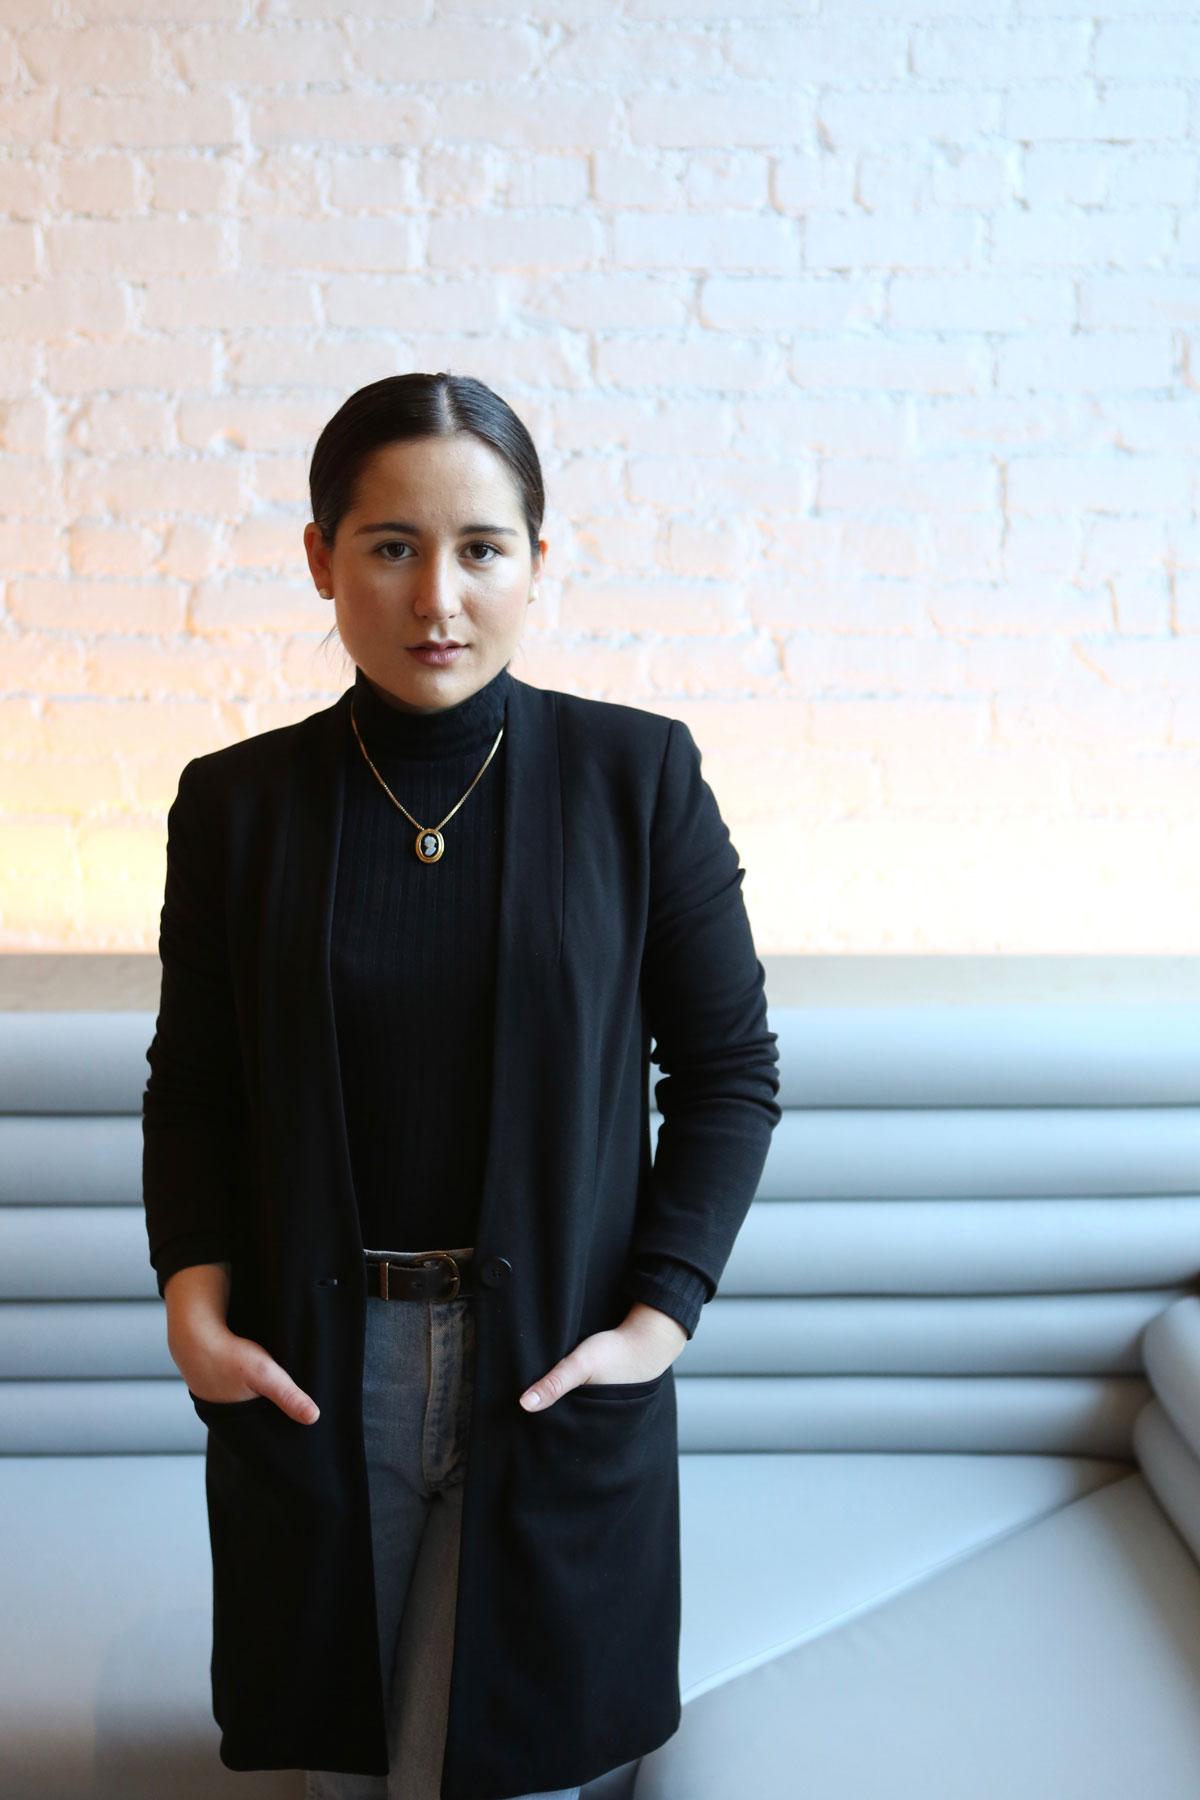 Melina-Peterson-Founder-Cornerlight-Digital.jpg